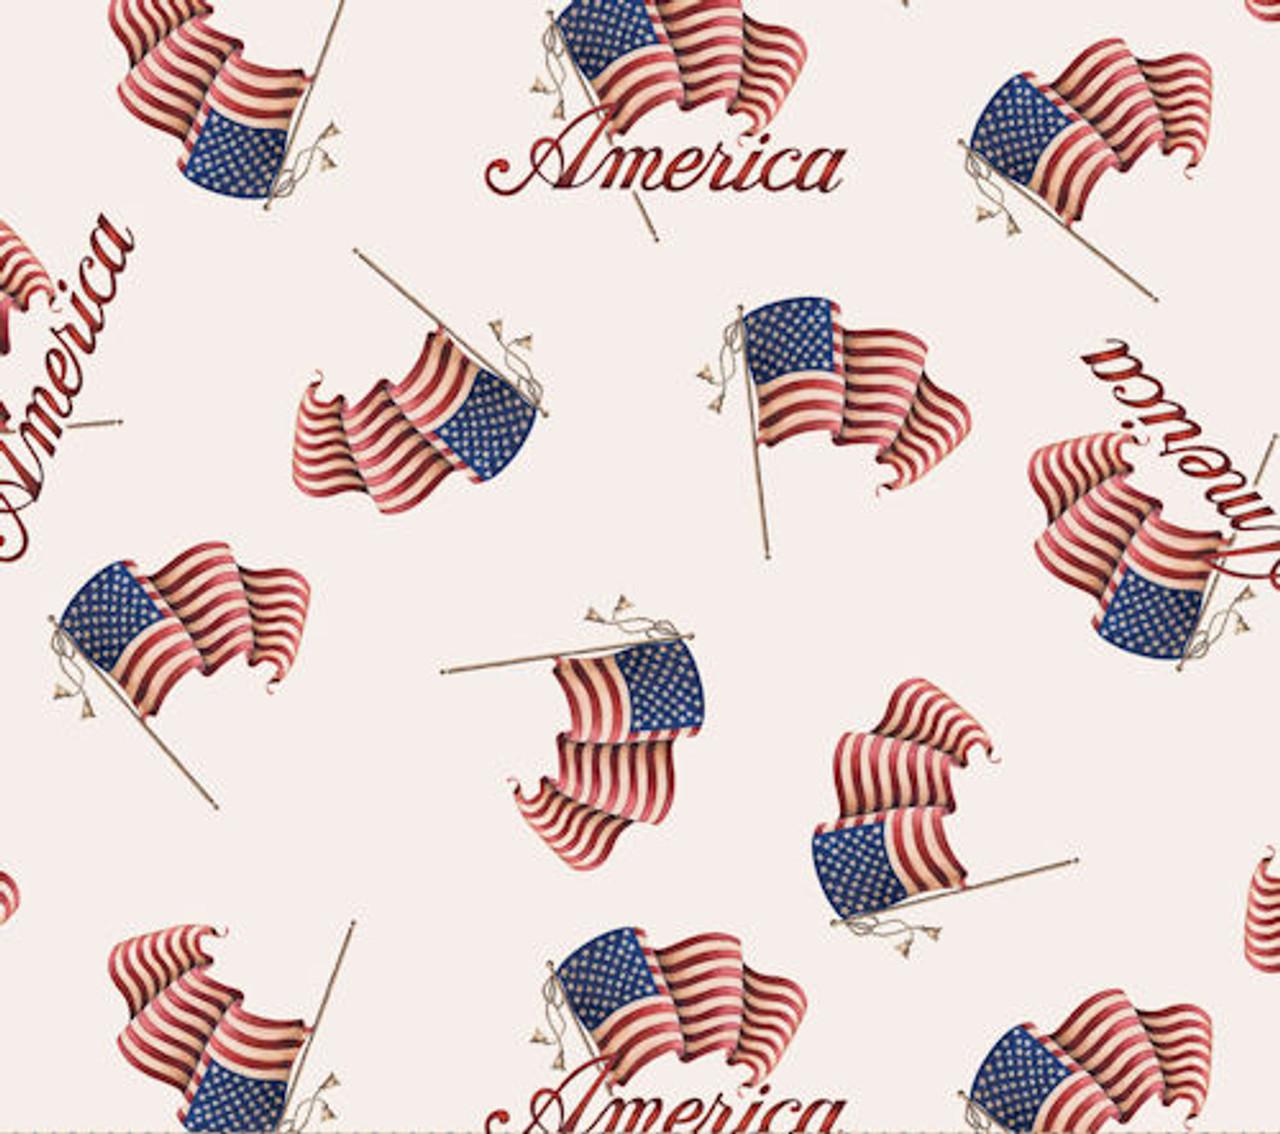 America Fabric